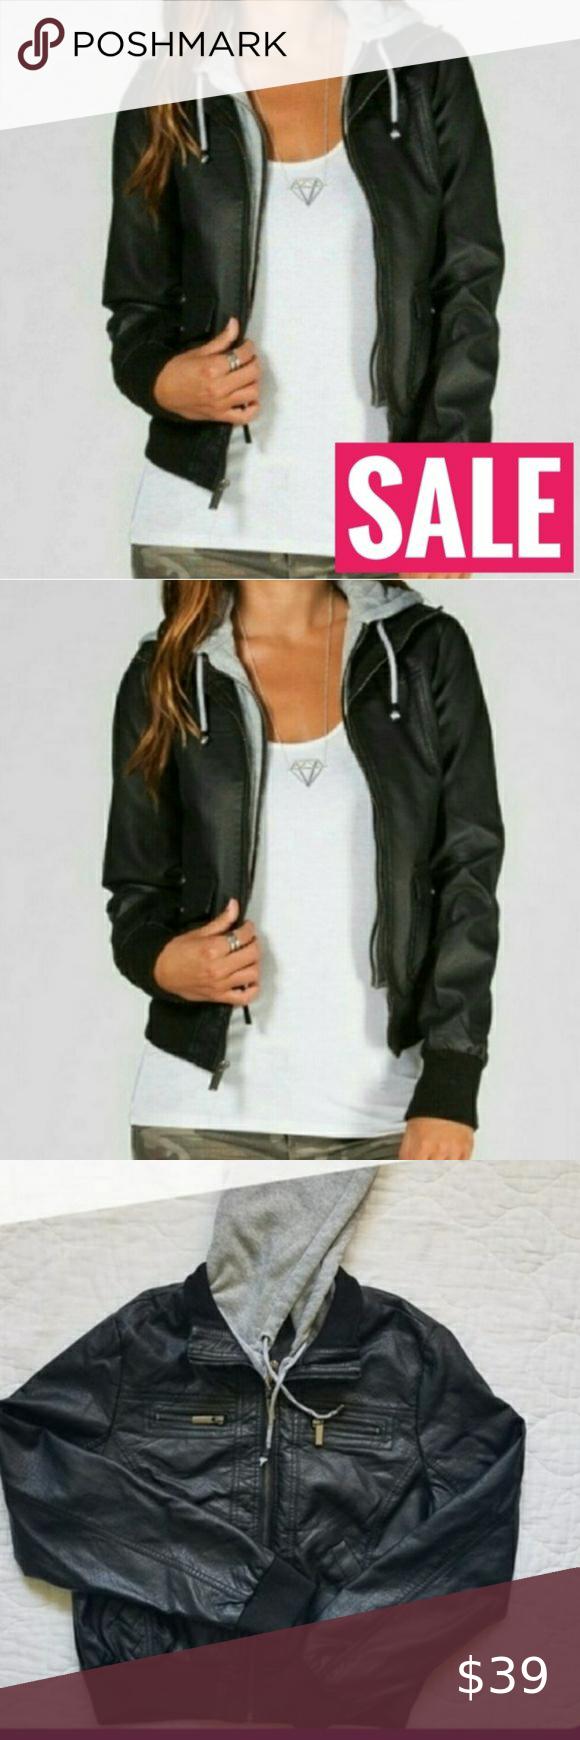 Sale Nwt Vegan Leather Sweatshirt Hoodie Layer Nwt Layered Jacket Notes Everyone Nee Leather Sweatshirt Womens Black Leather Jacket Maroon Leather Jacket [ 1740 x 580 Pixel ]